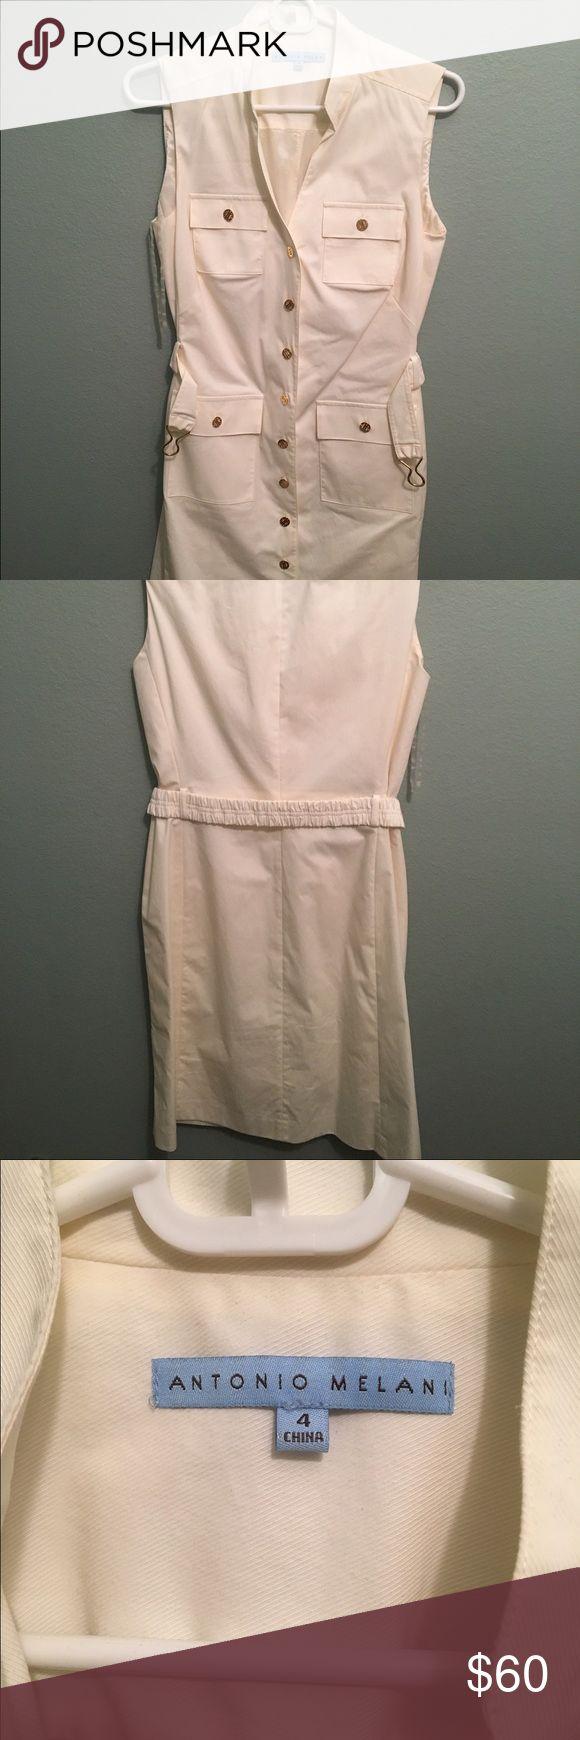 Antonio Melani White Dress Antonio Melani White Jacket/Dress ANTONIO MELANI Dresses